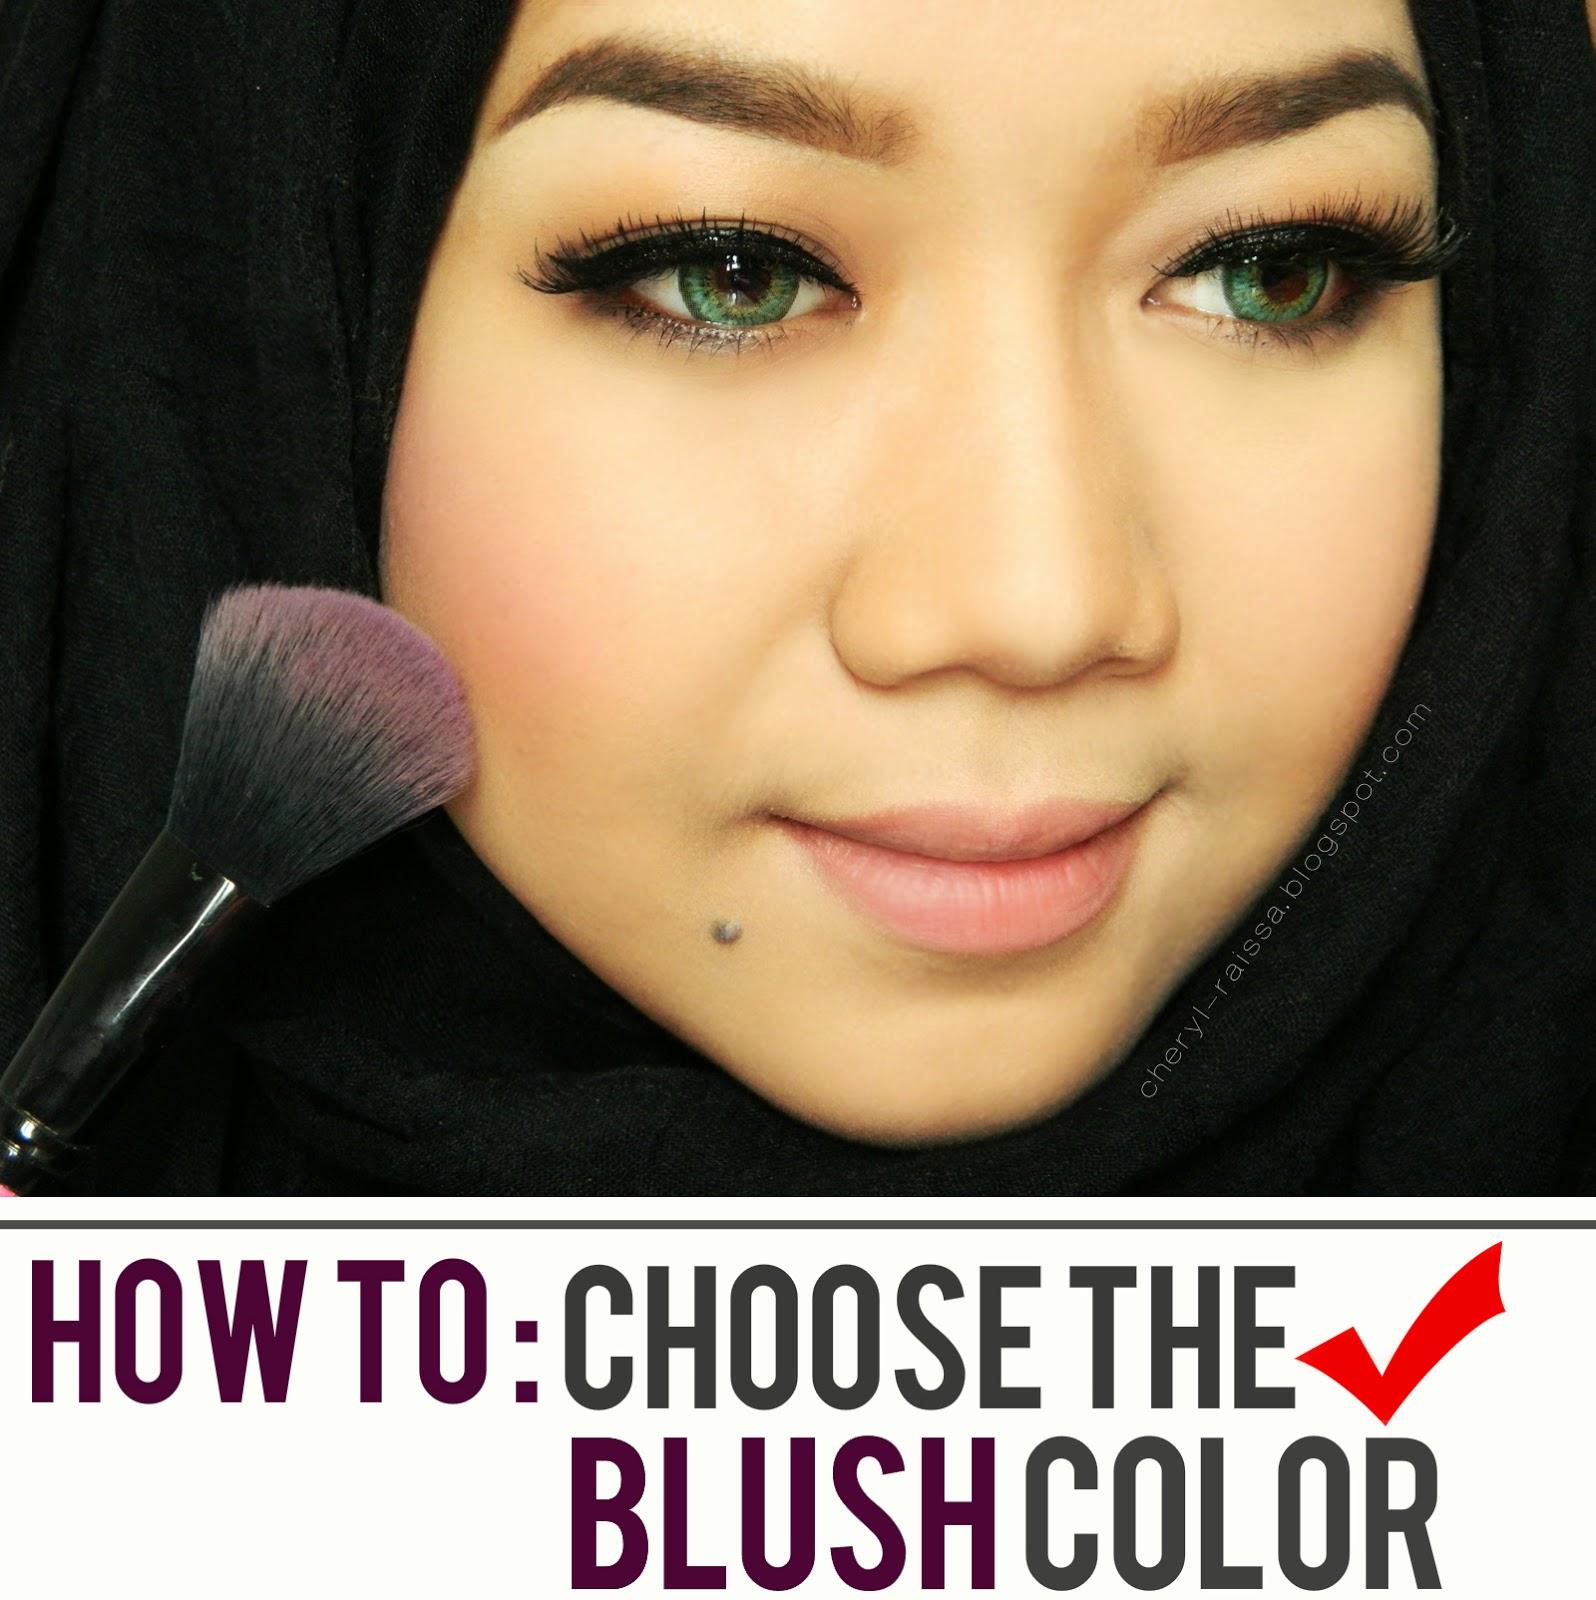 Fair tone kulit ini sebenarnya cocok dengan bermacam warna namun pastikan pengaplikasian yang tepat sesuaikan dengan eyemakeup dan jenis kulit untuk